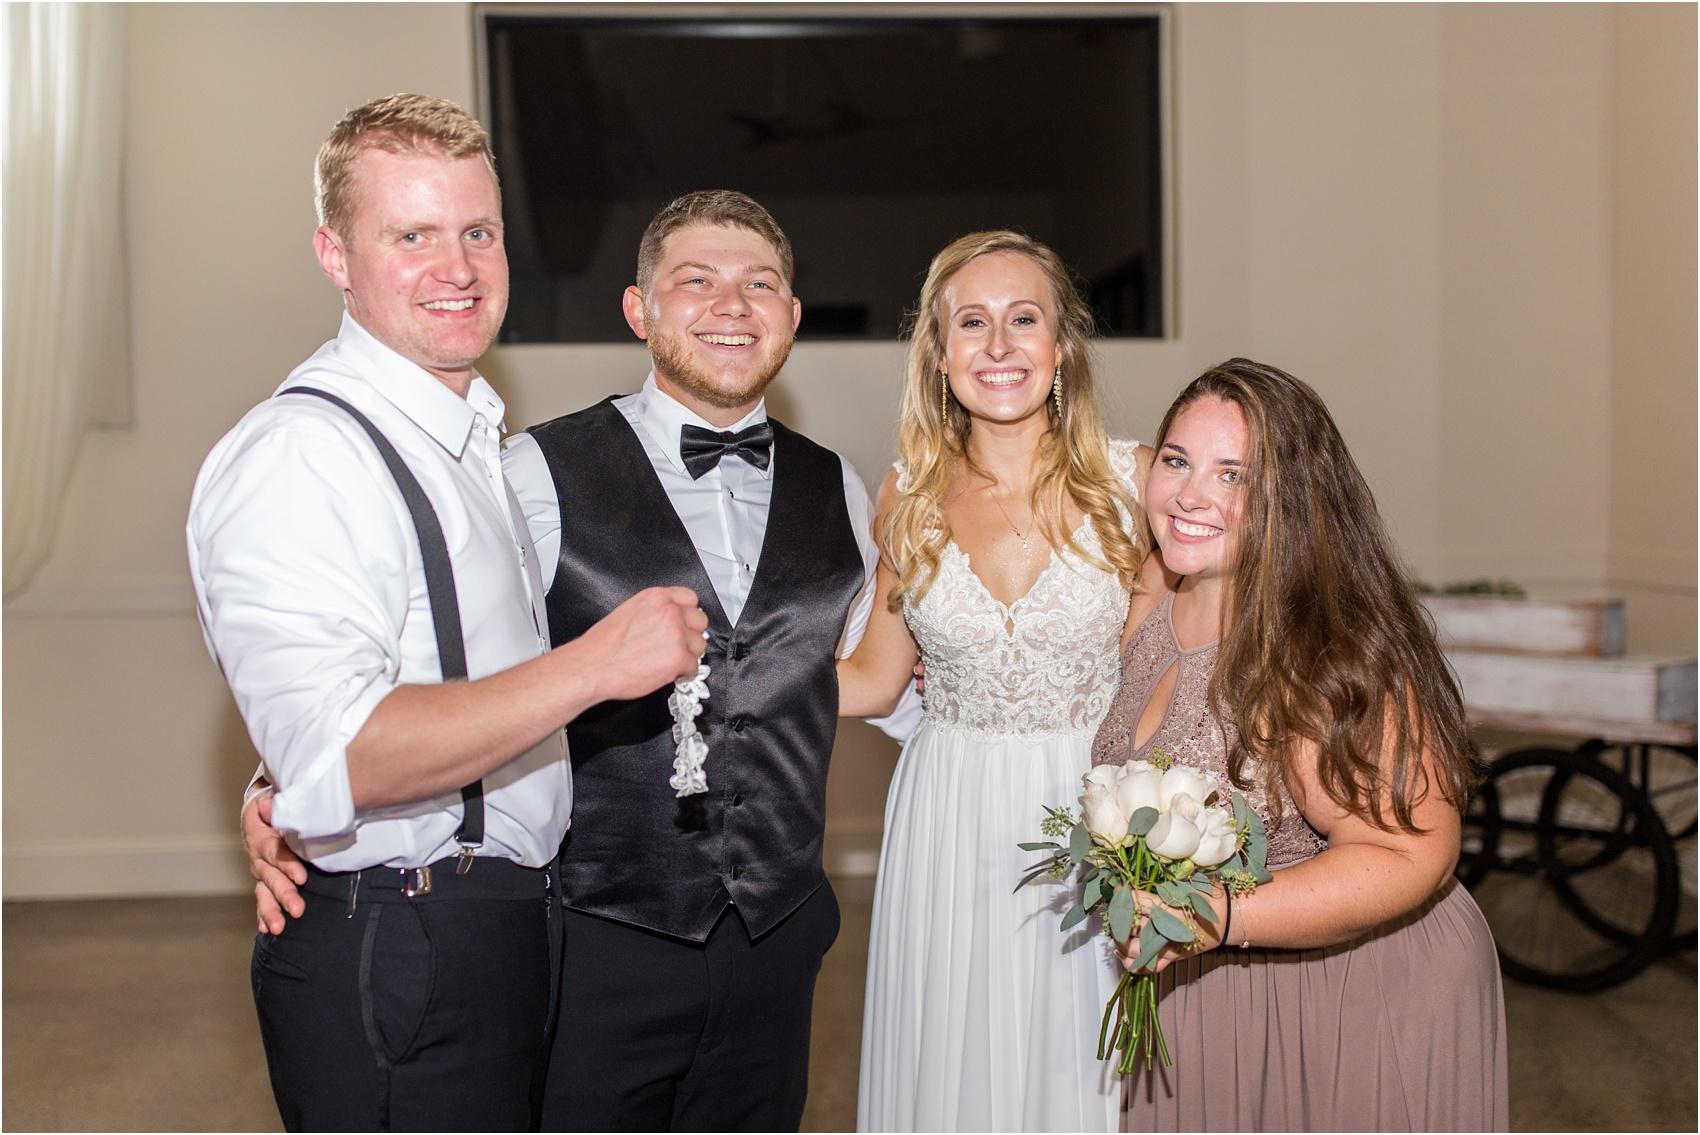 Savannah Eve Photography- Jurek-Woodworth Wedding- Sneak Peek-113.jpg